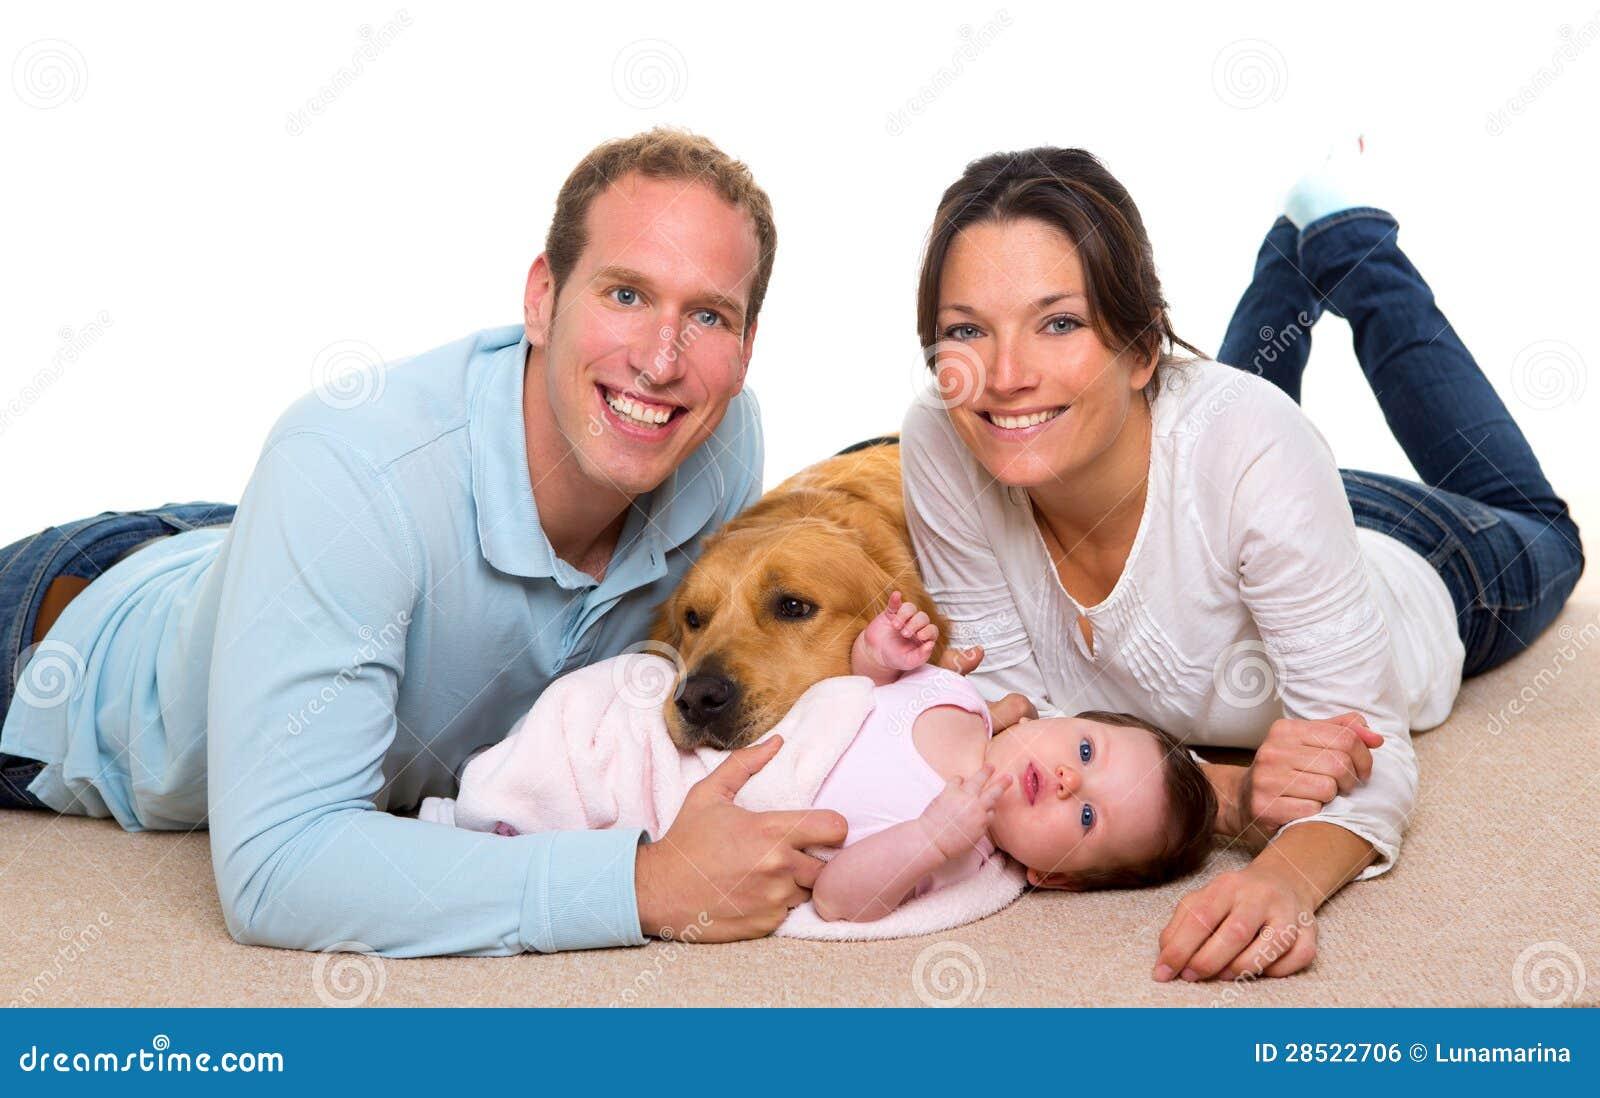 women dogs happy relationships